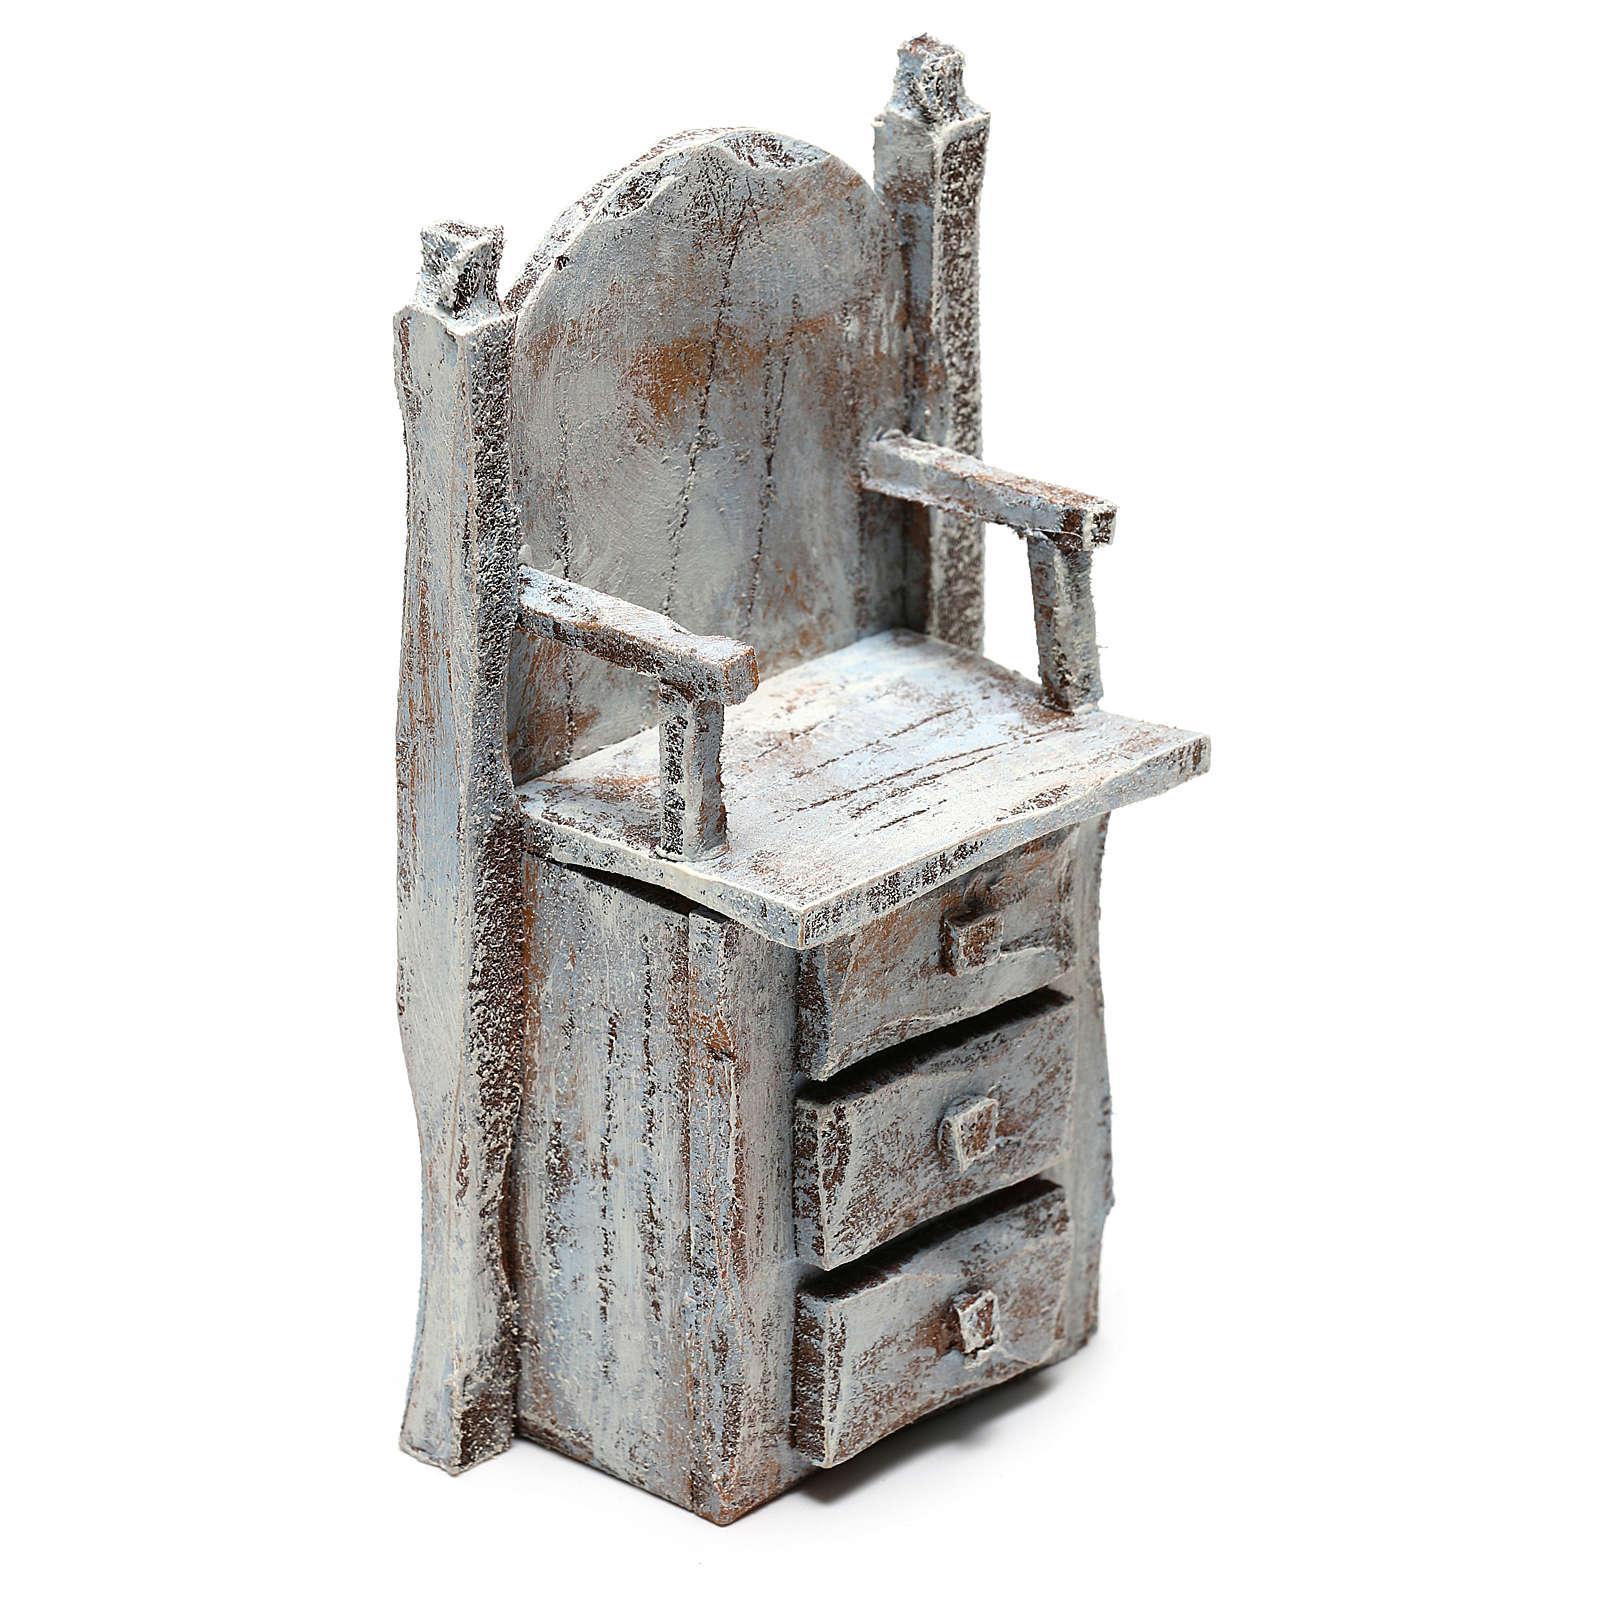 Chair for shoe shine Nativity scene 12 cm 4